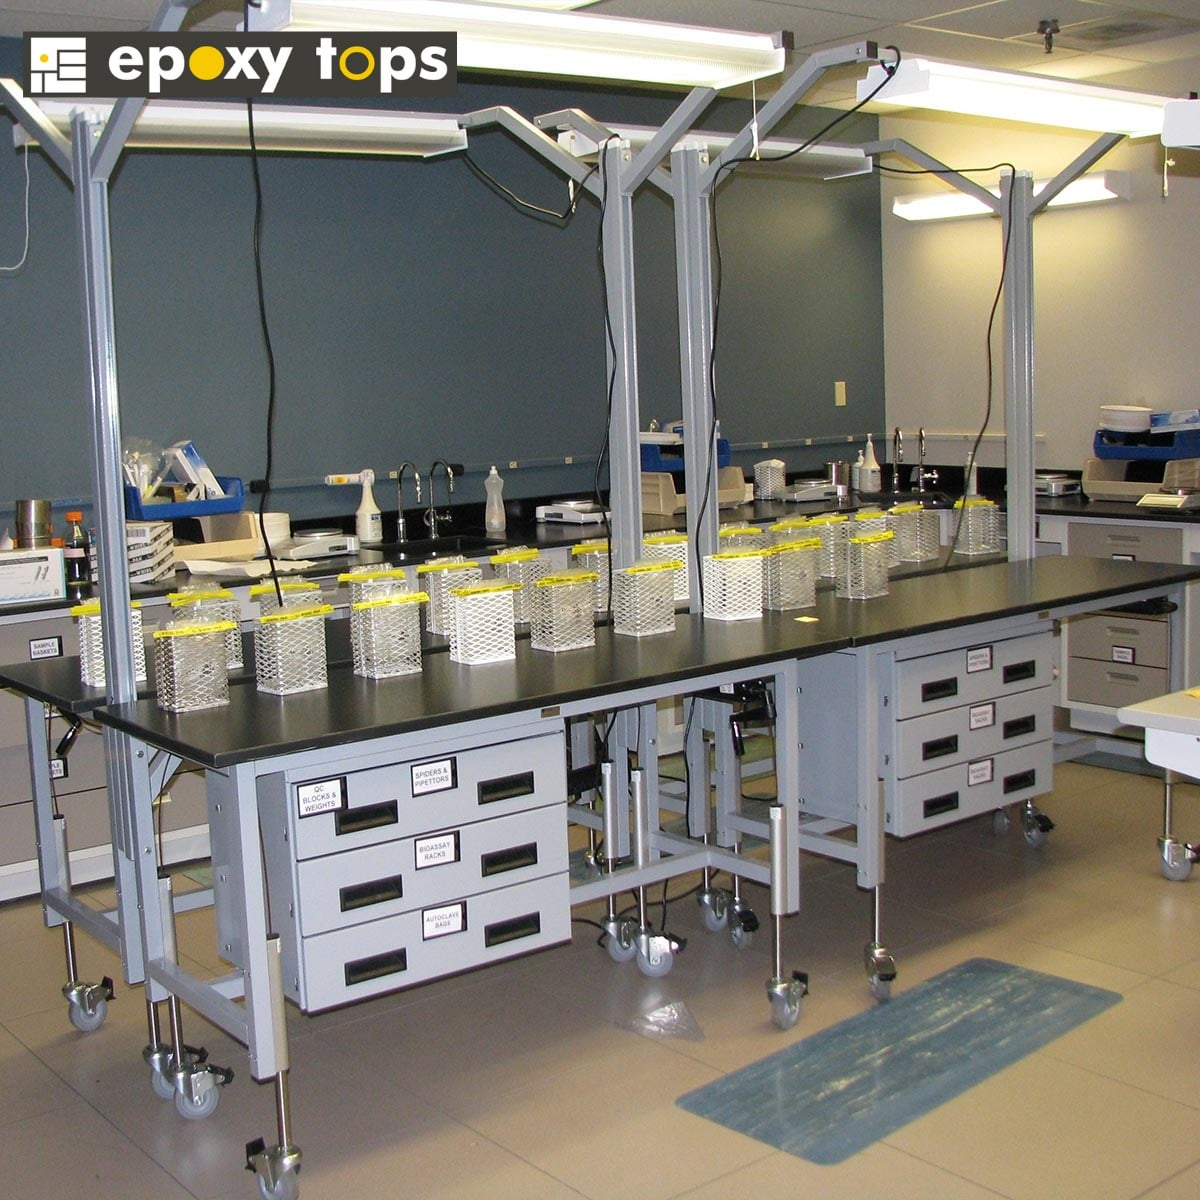 adaptable lab workbench with phenolic resin